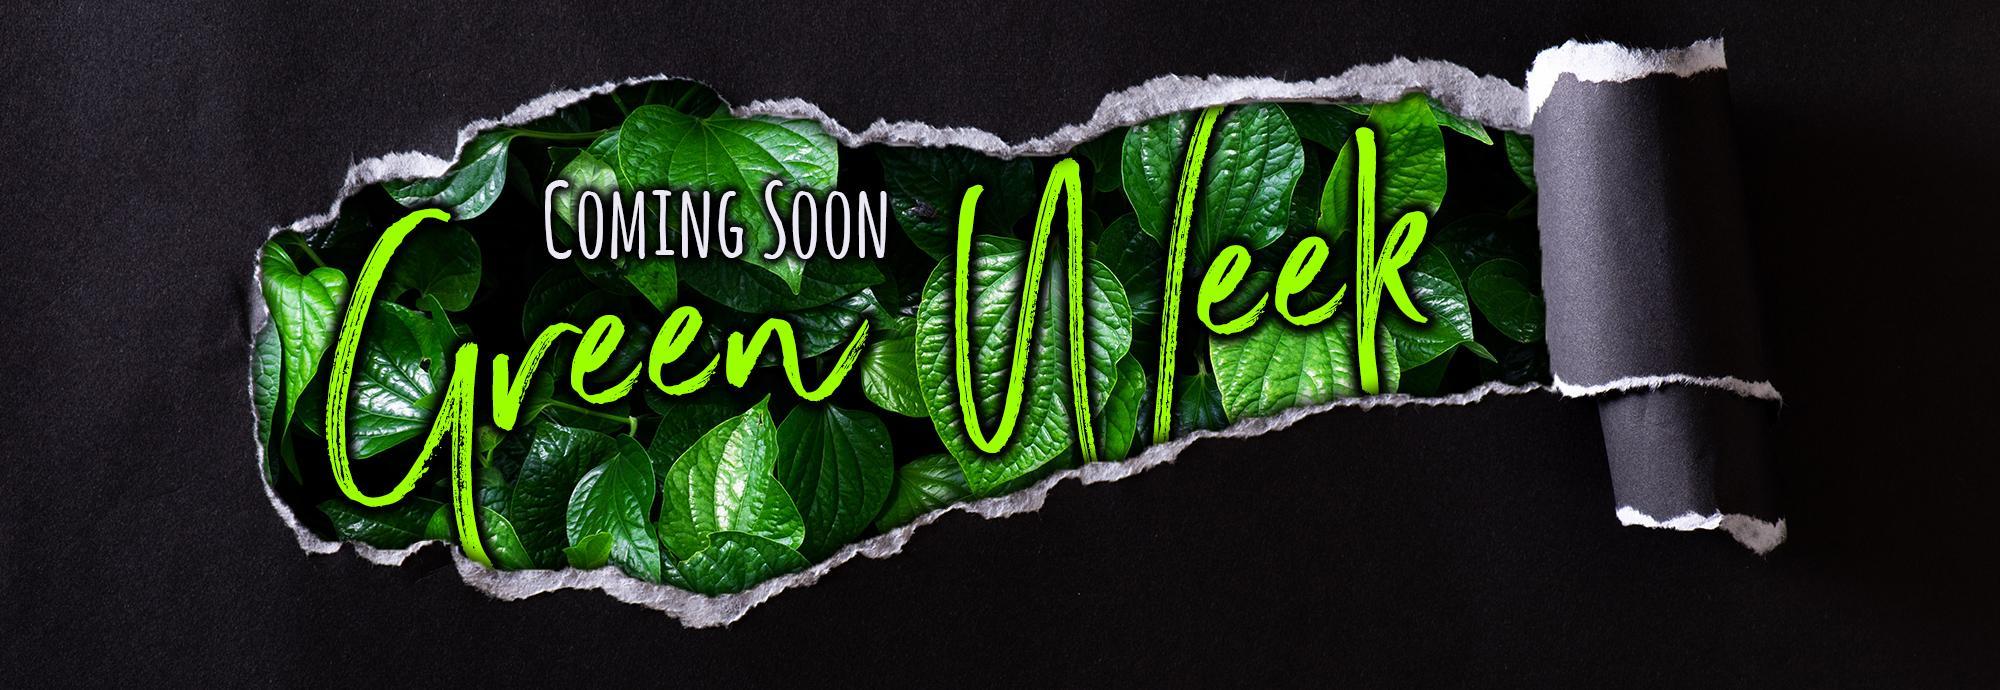 hero_banner_teaser-greenweek